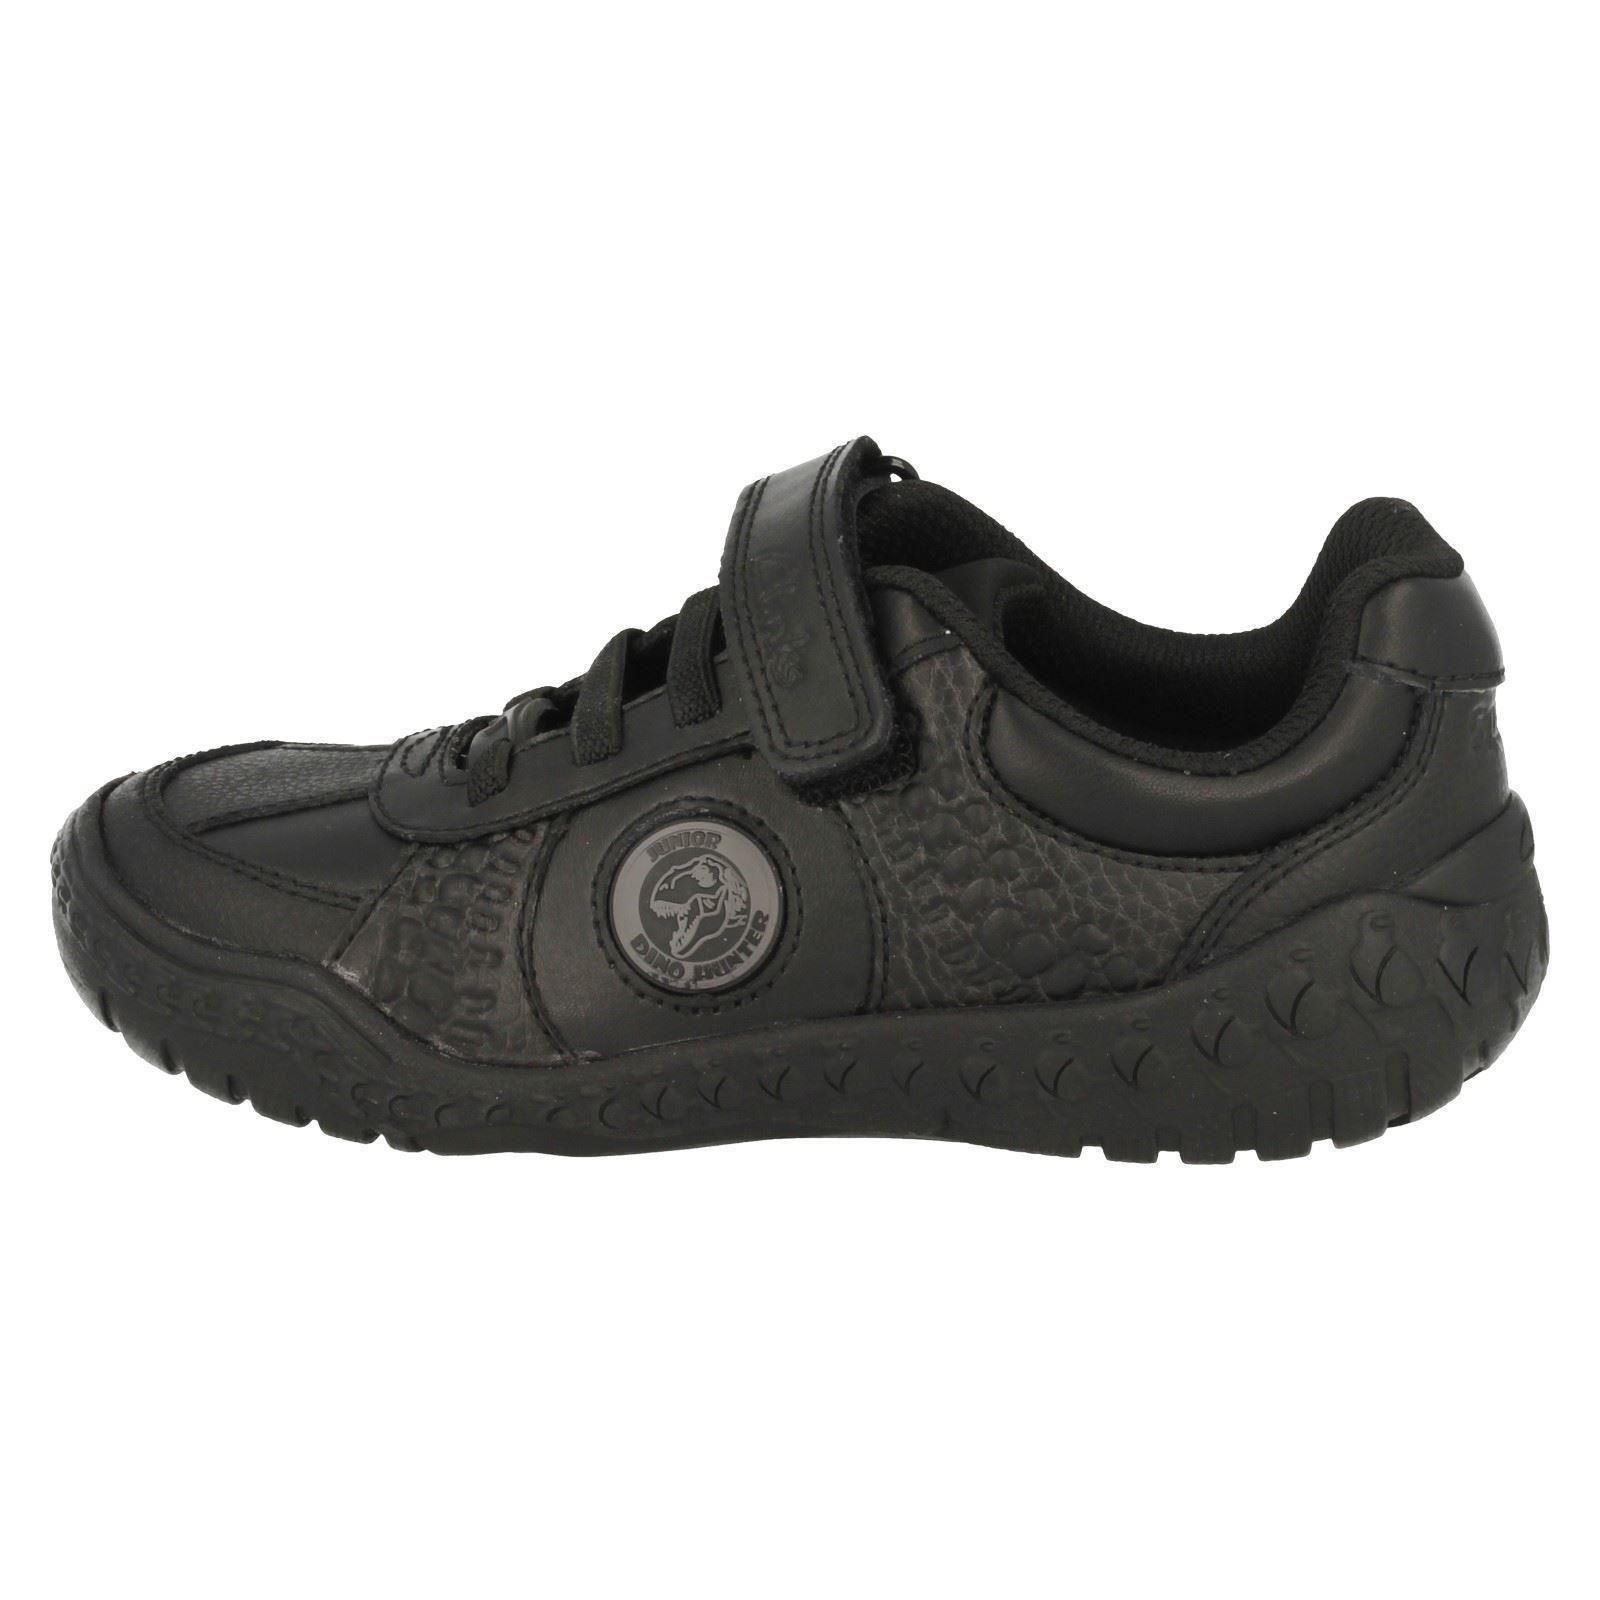 Boys Clarks School Shoes /'Stomp Rex/'